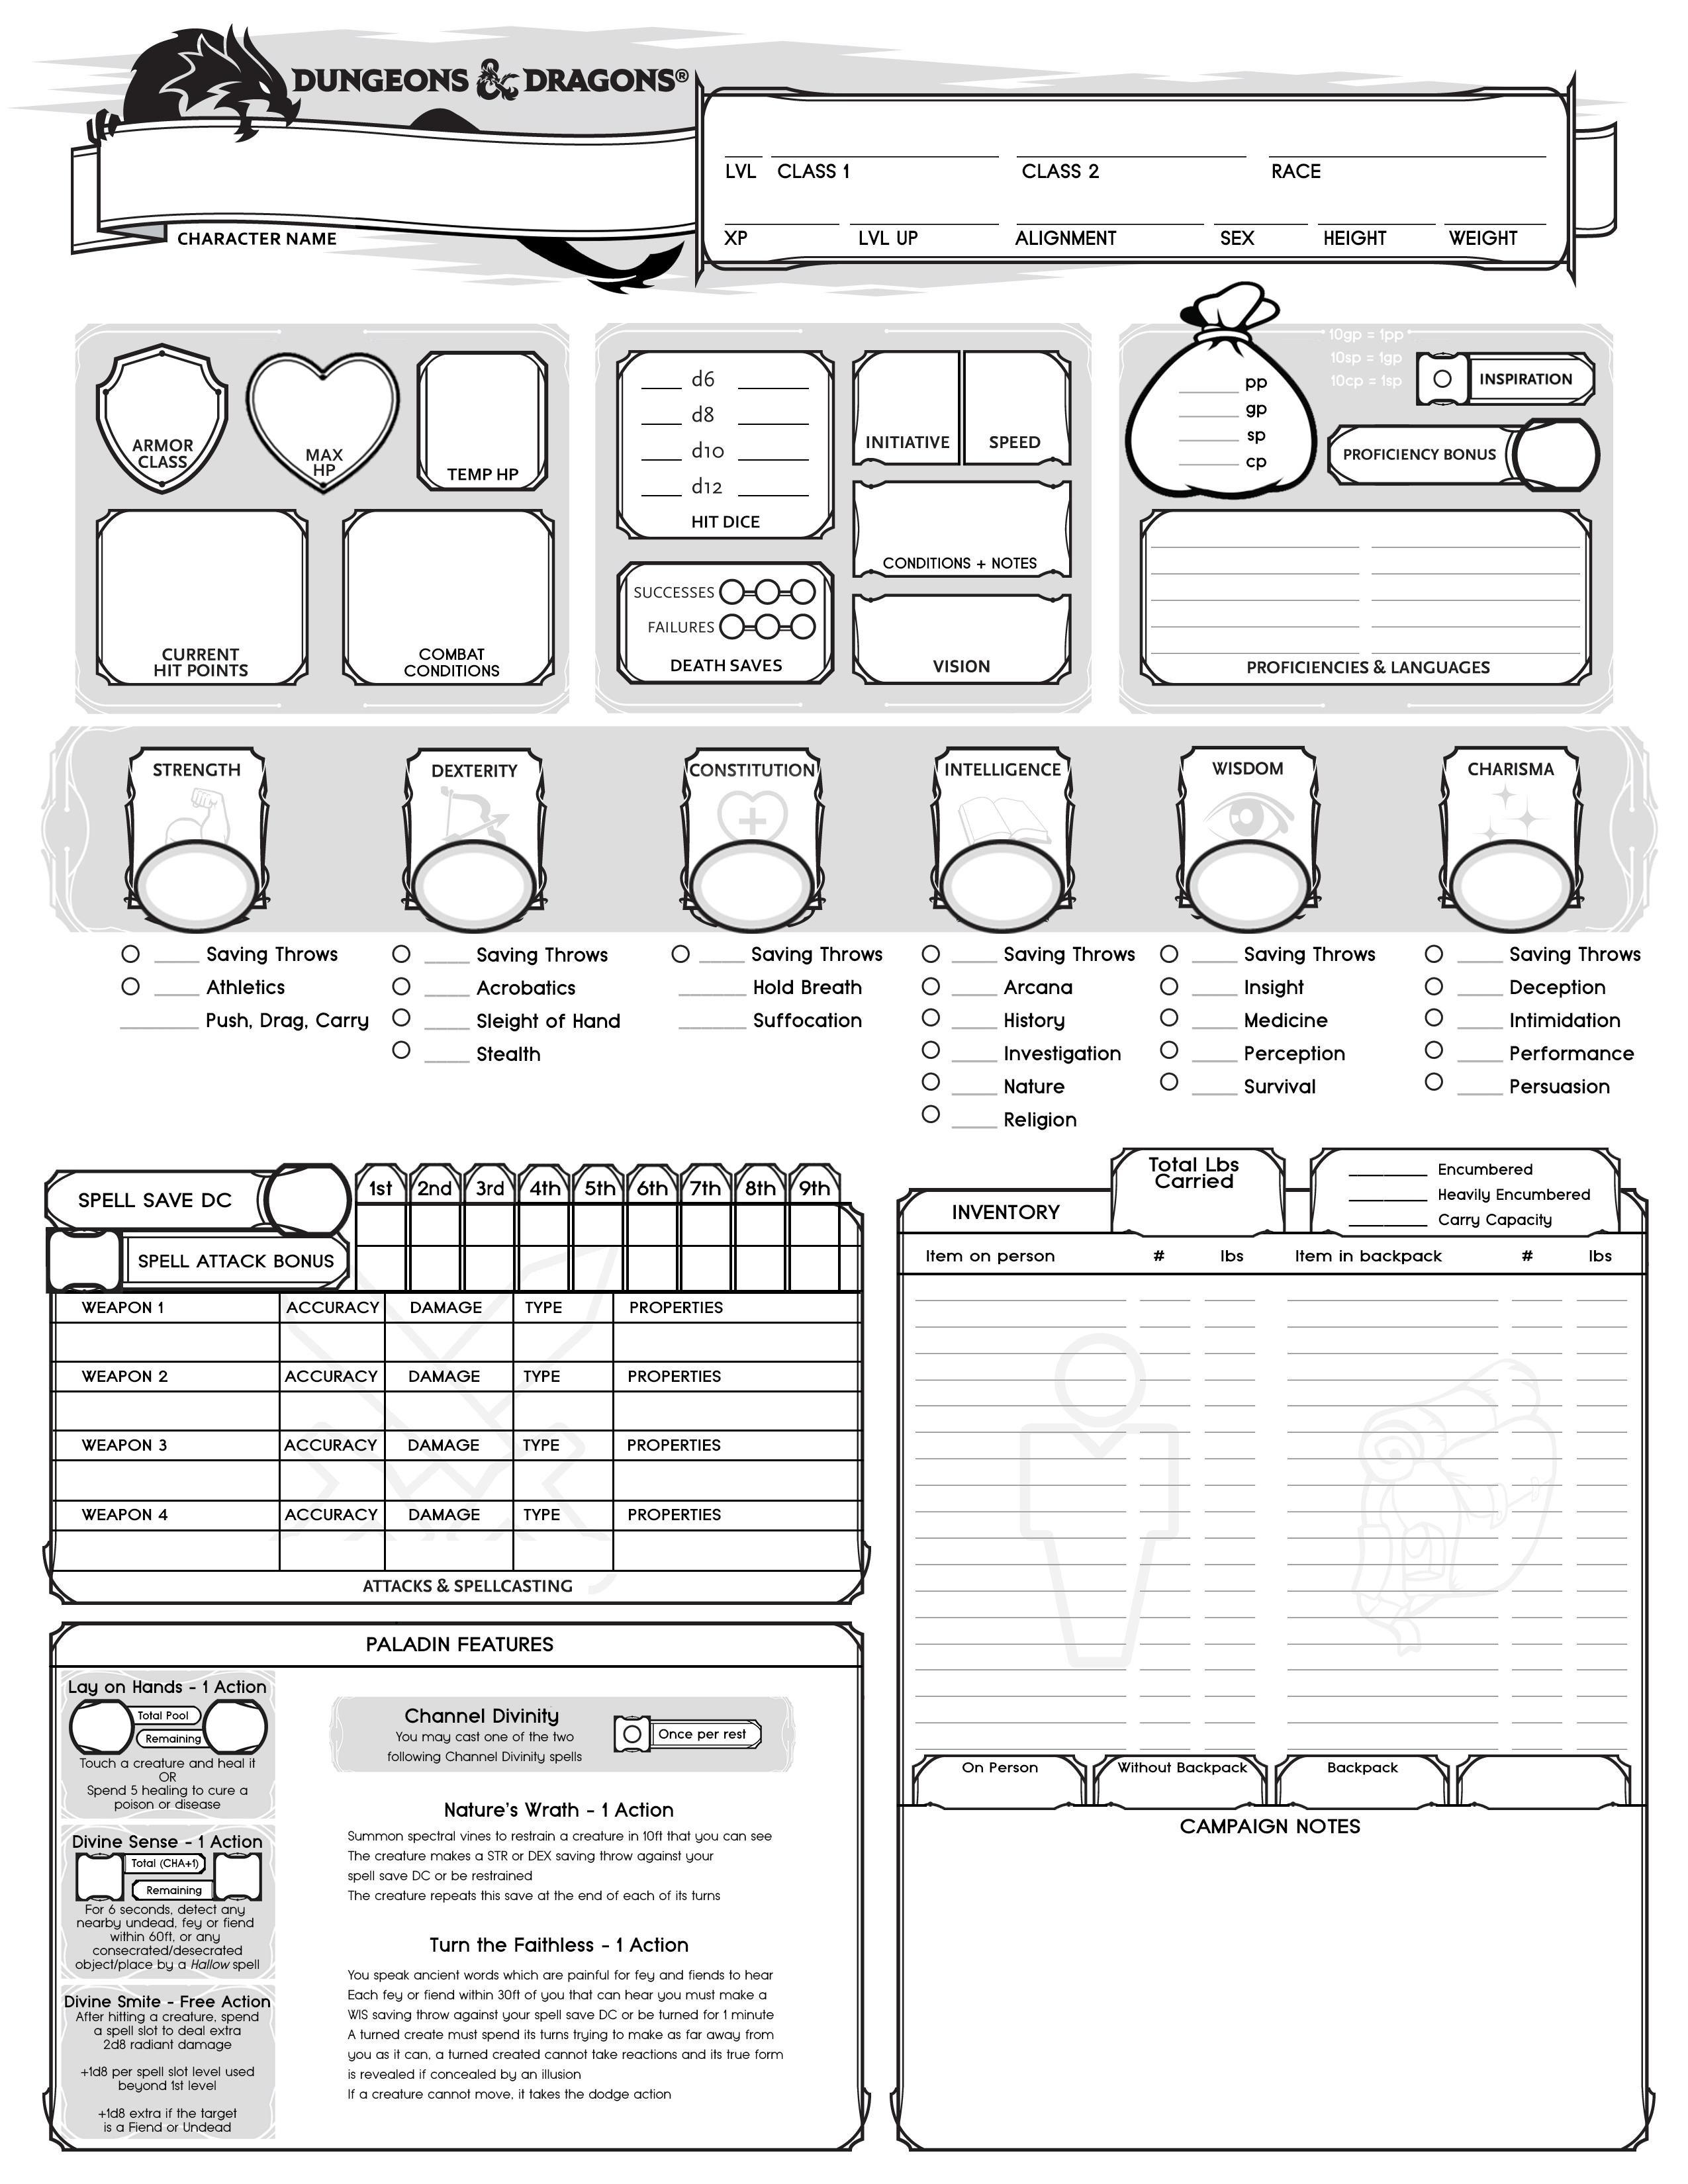 [OC] I made a custom 5e Character sheet for the paladin in